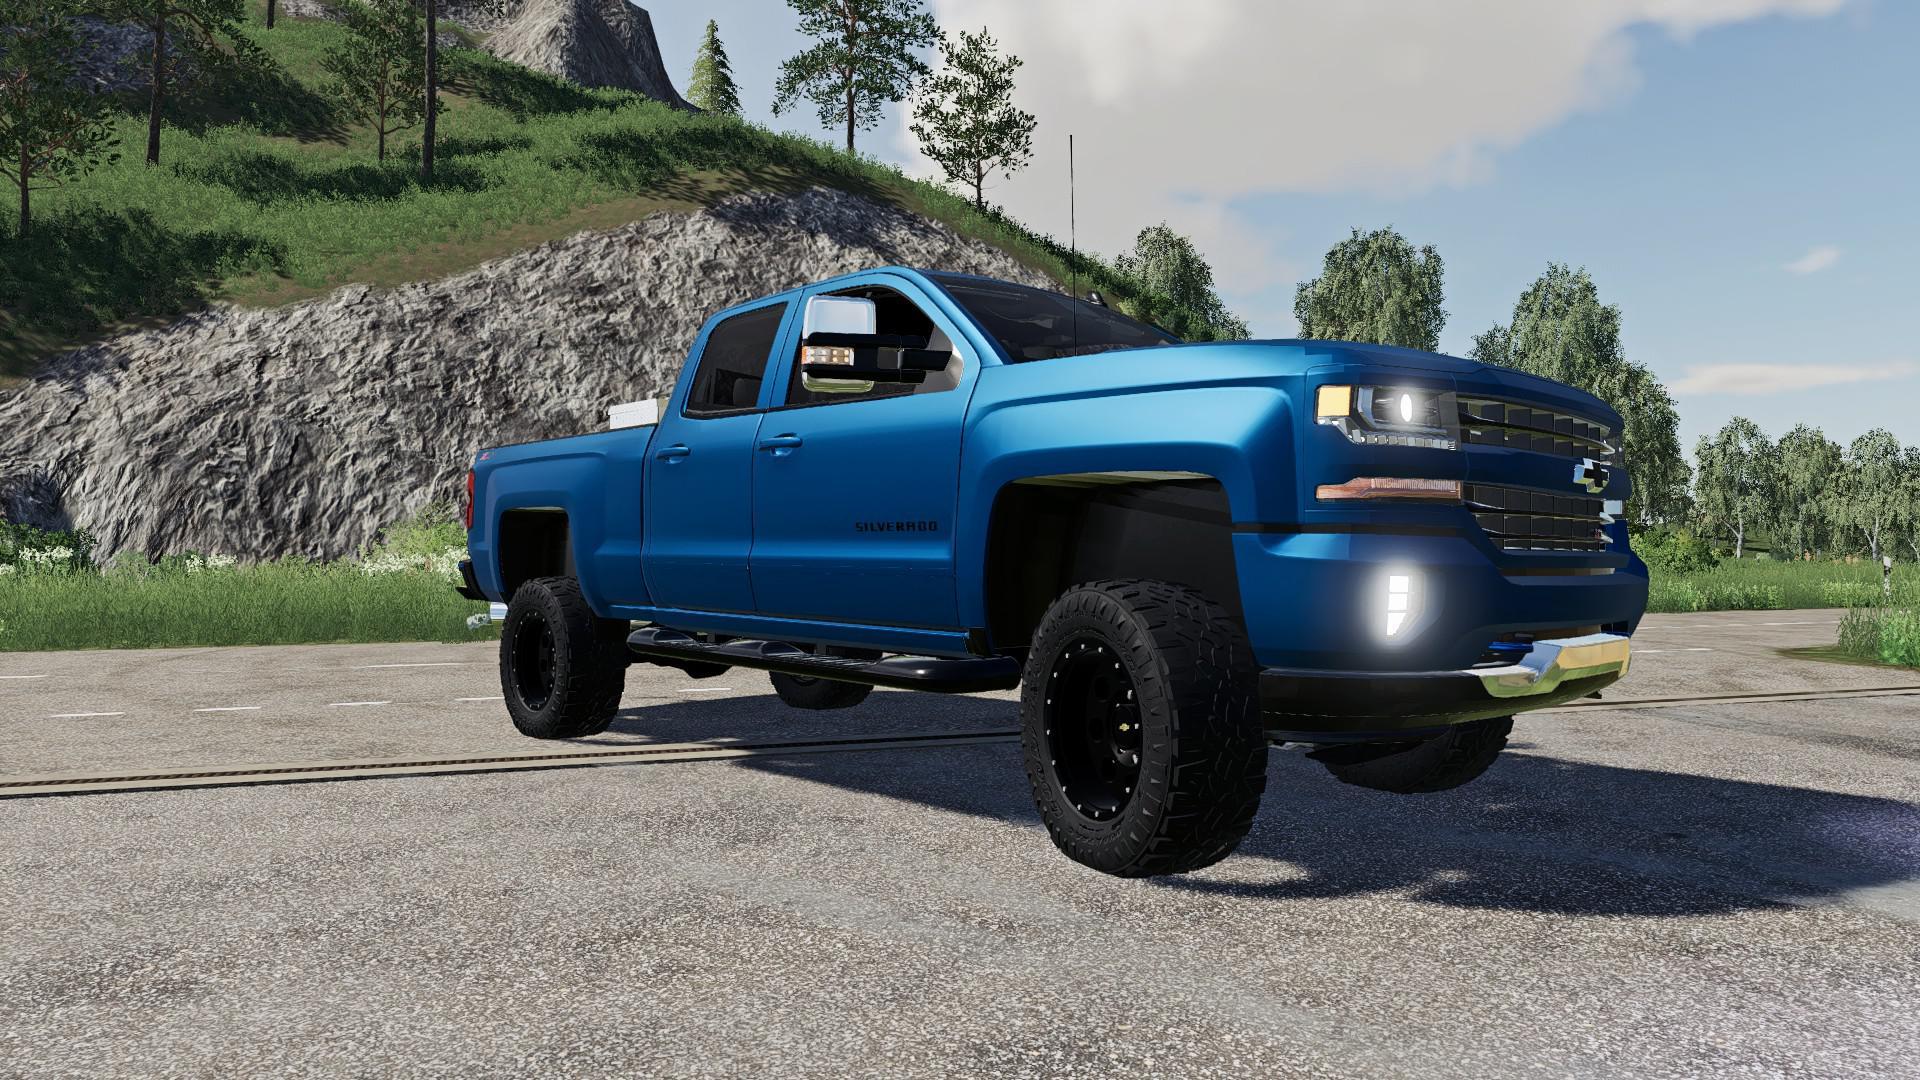 Types Of Rims >> LS19 Chevrolet Silverado 1500 v1.0 - Farming Simulator 19 mod, LS19 Mod download!